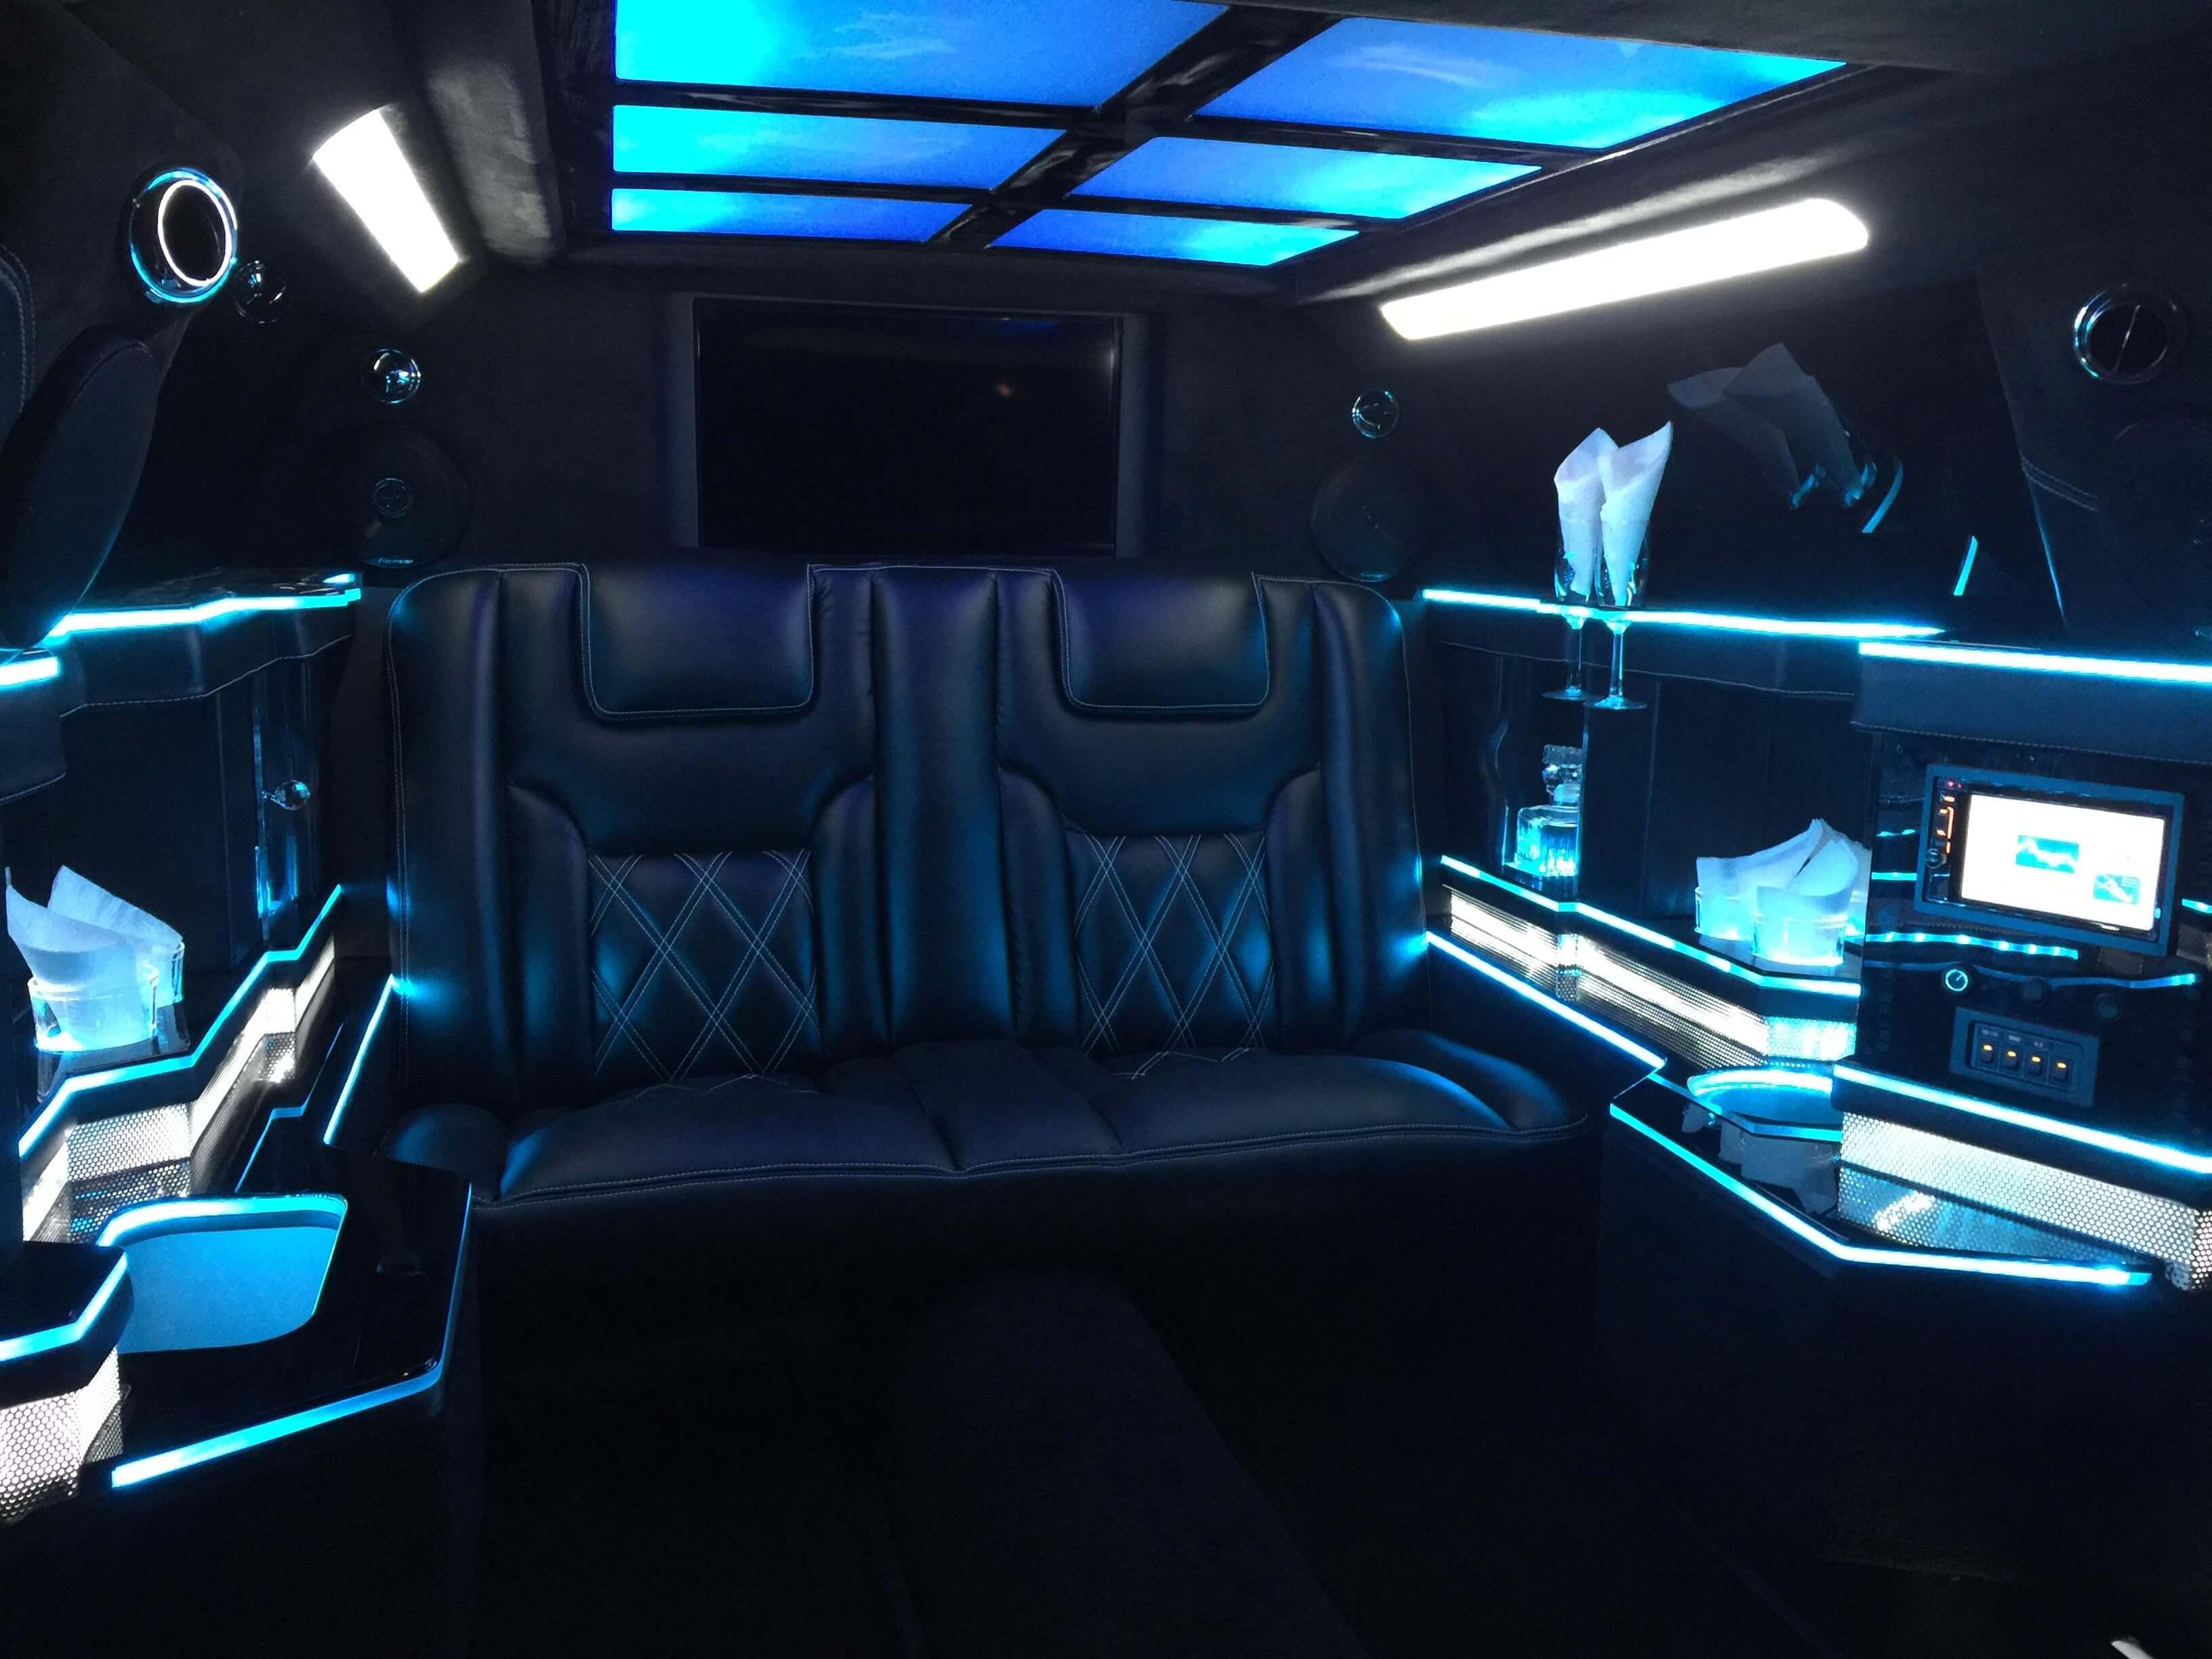 70 inch Chrysler 300 limousine